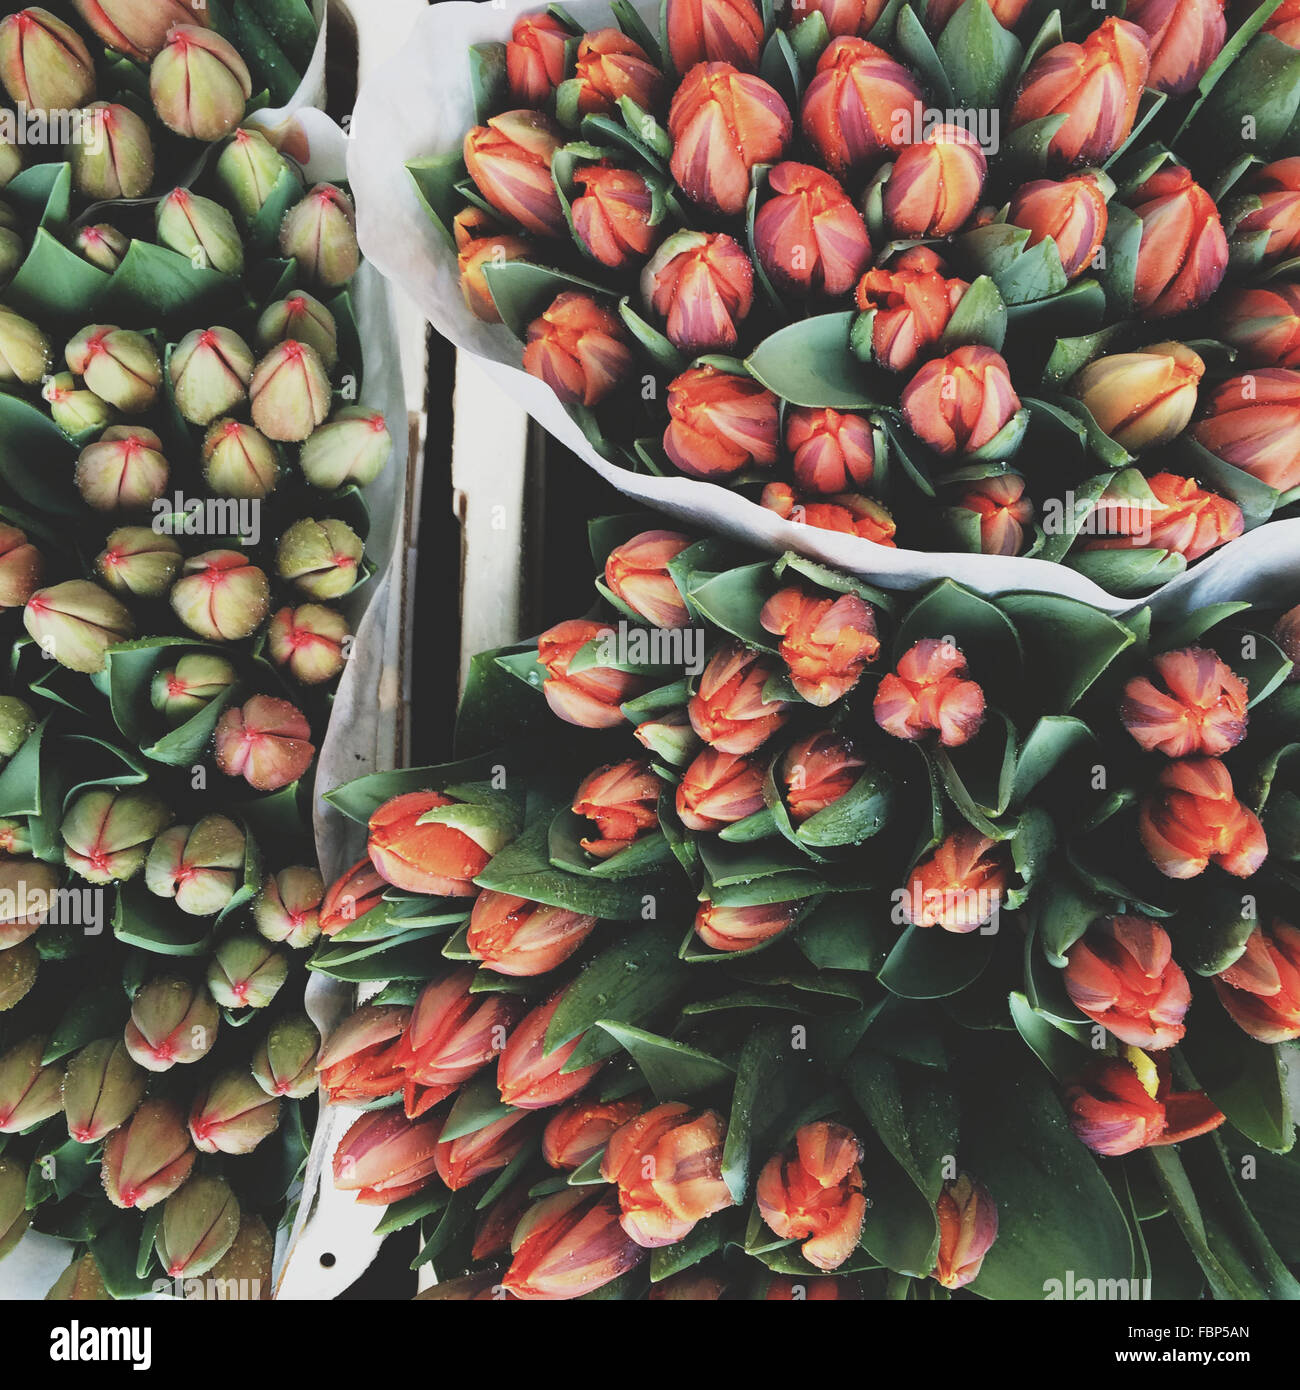 Full Frame Shot Of Flowers Buds For Sale In Market - Stock Image